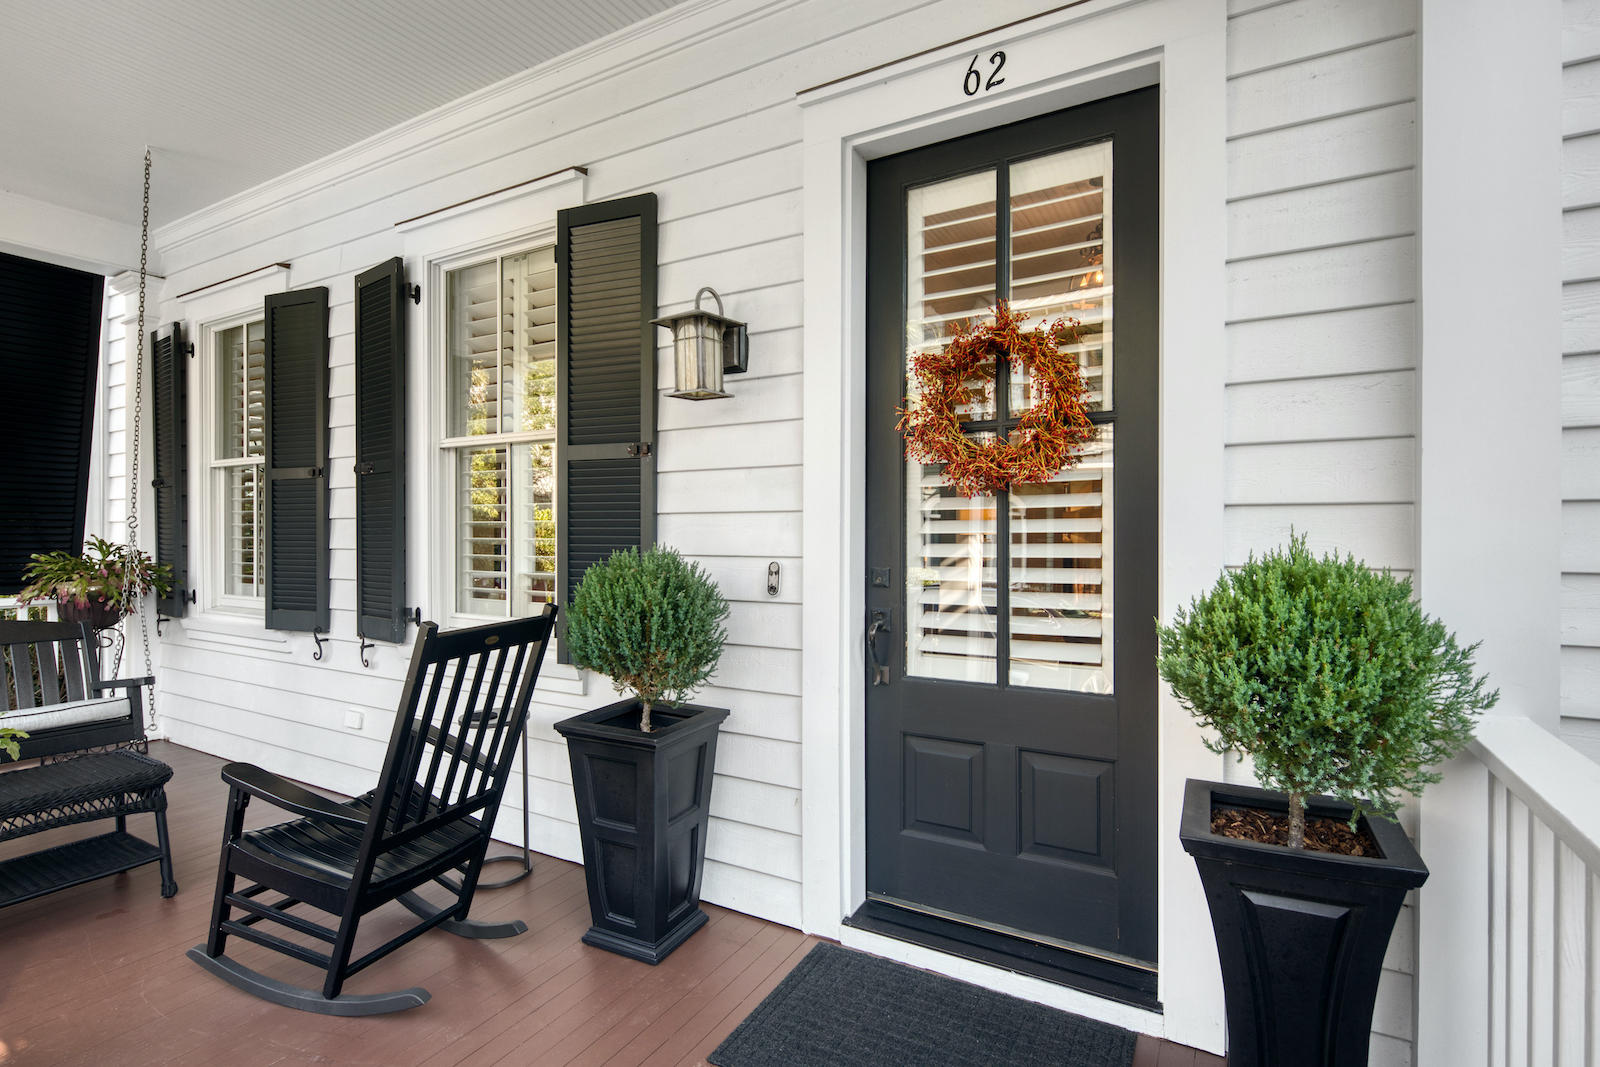 Ion Homes For Sale - 62 Sanibel, Mount Pleasant, SC - 38